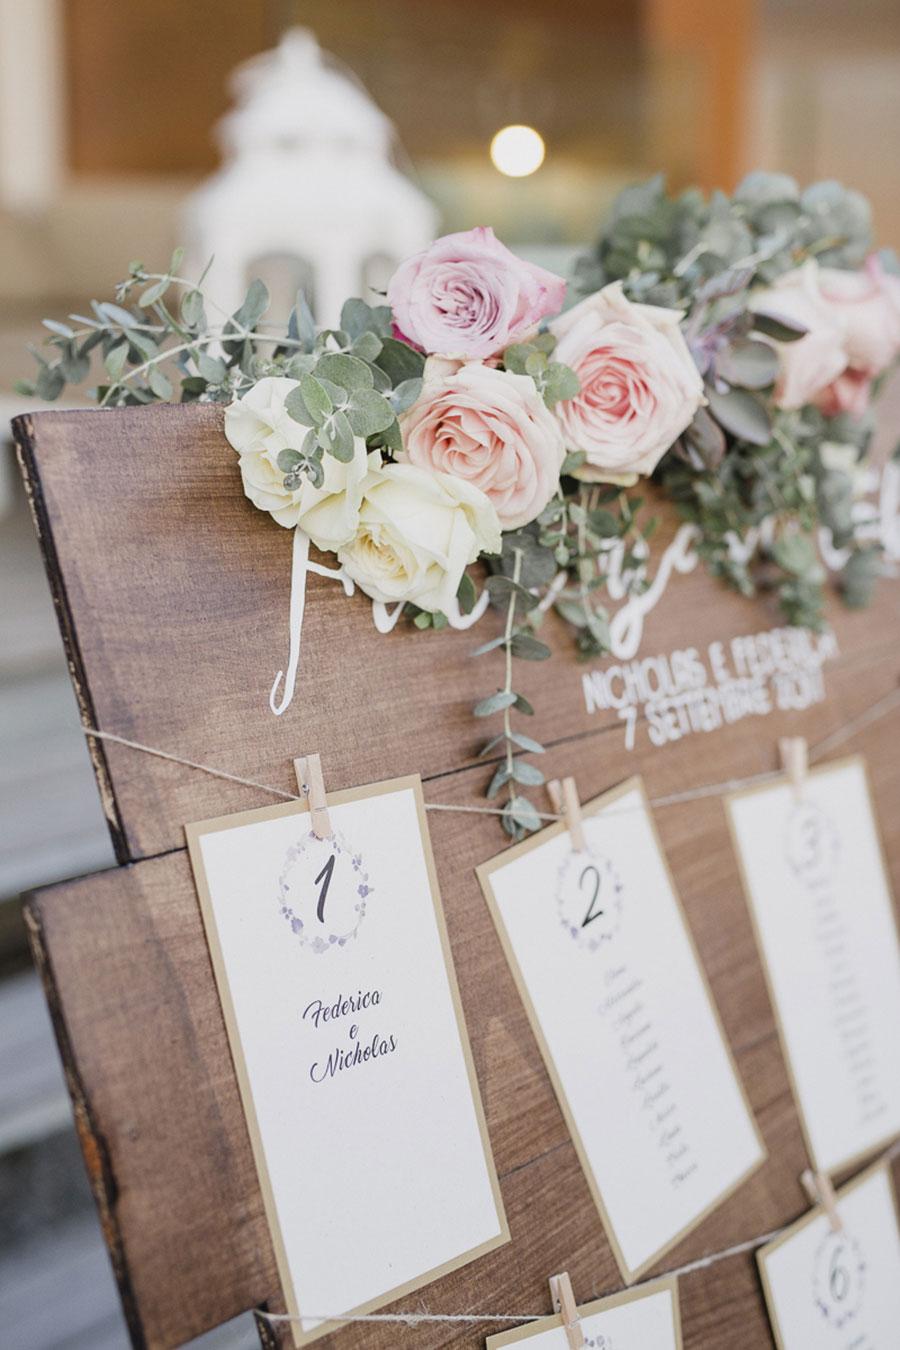 Wedding-Nicholad-and-Federica-Giuseppe-Giovannelli-39